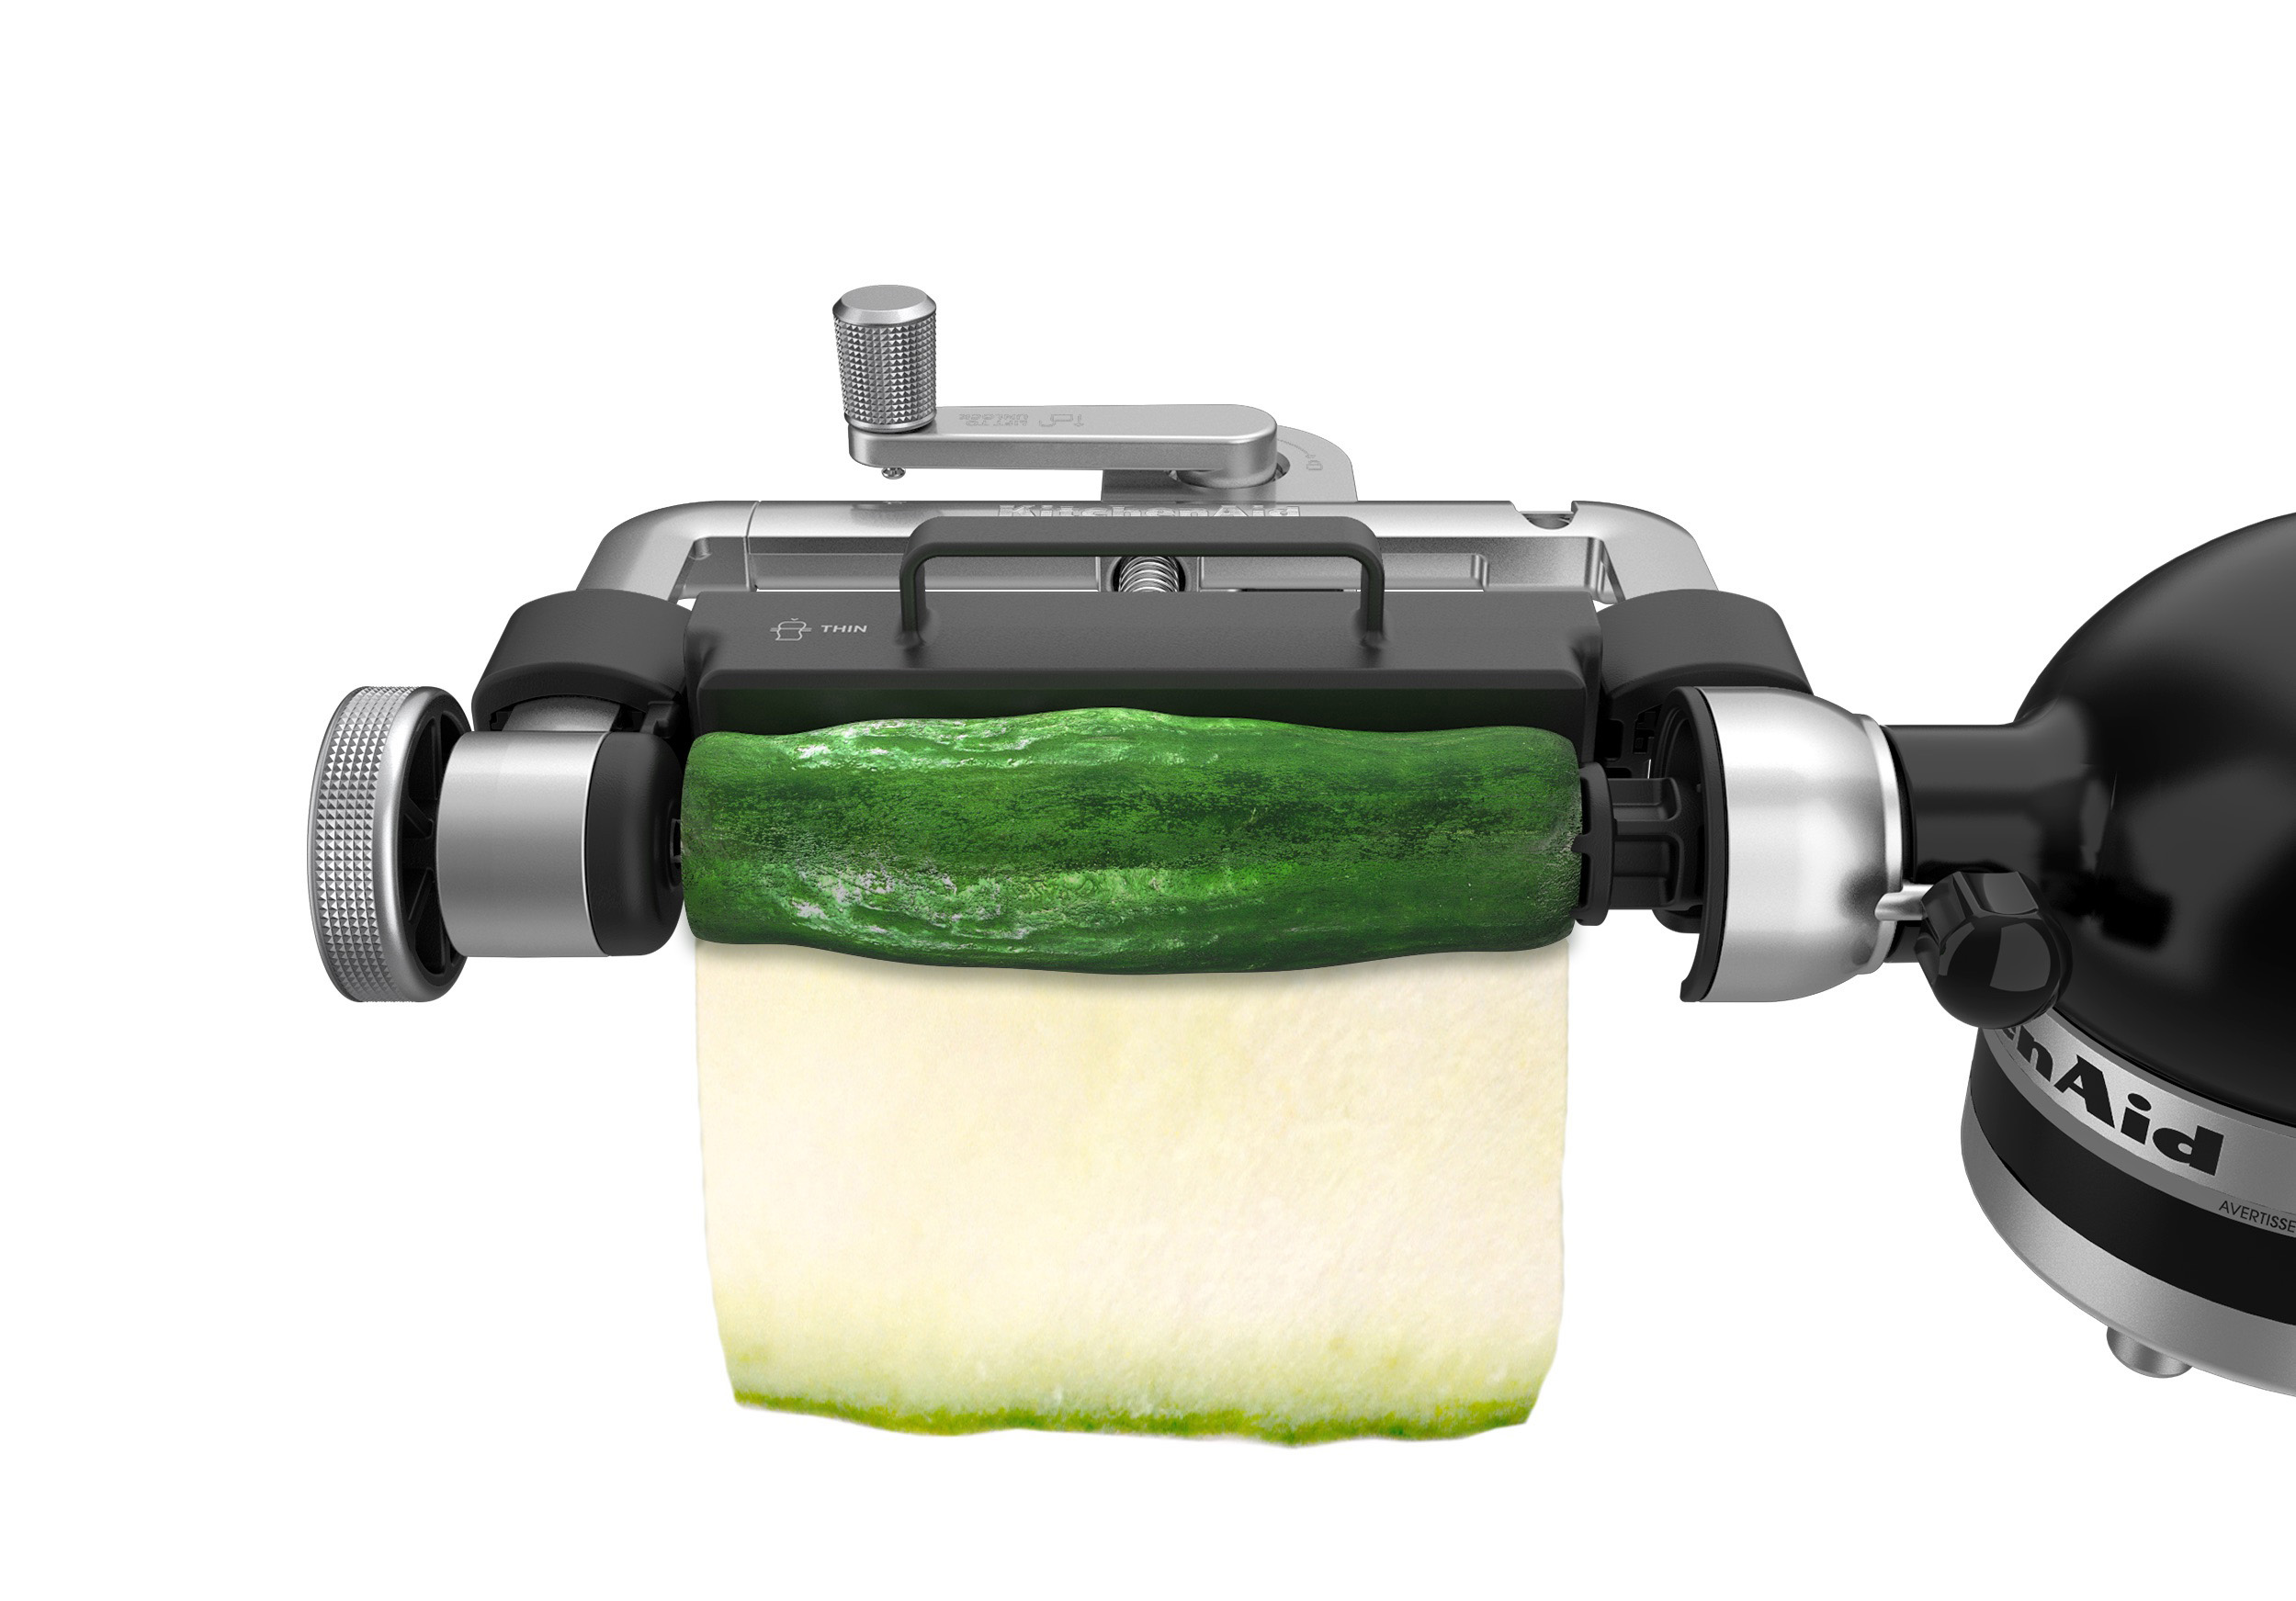 New Attachments Help Make Kitchenaid® Stand Mixer A True